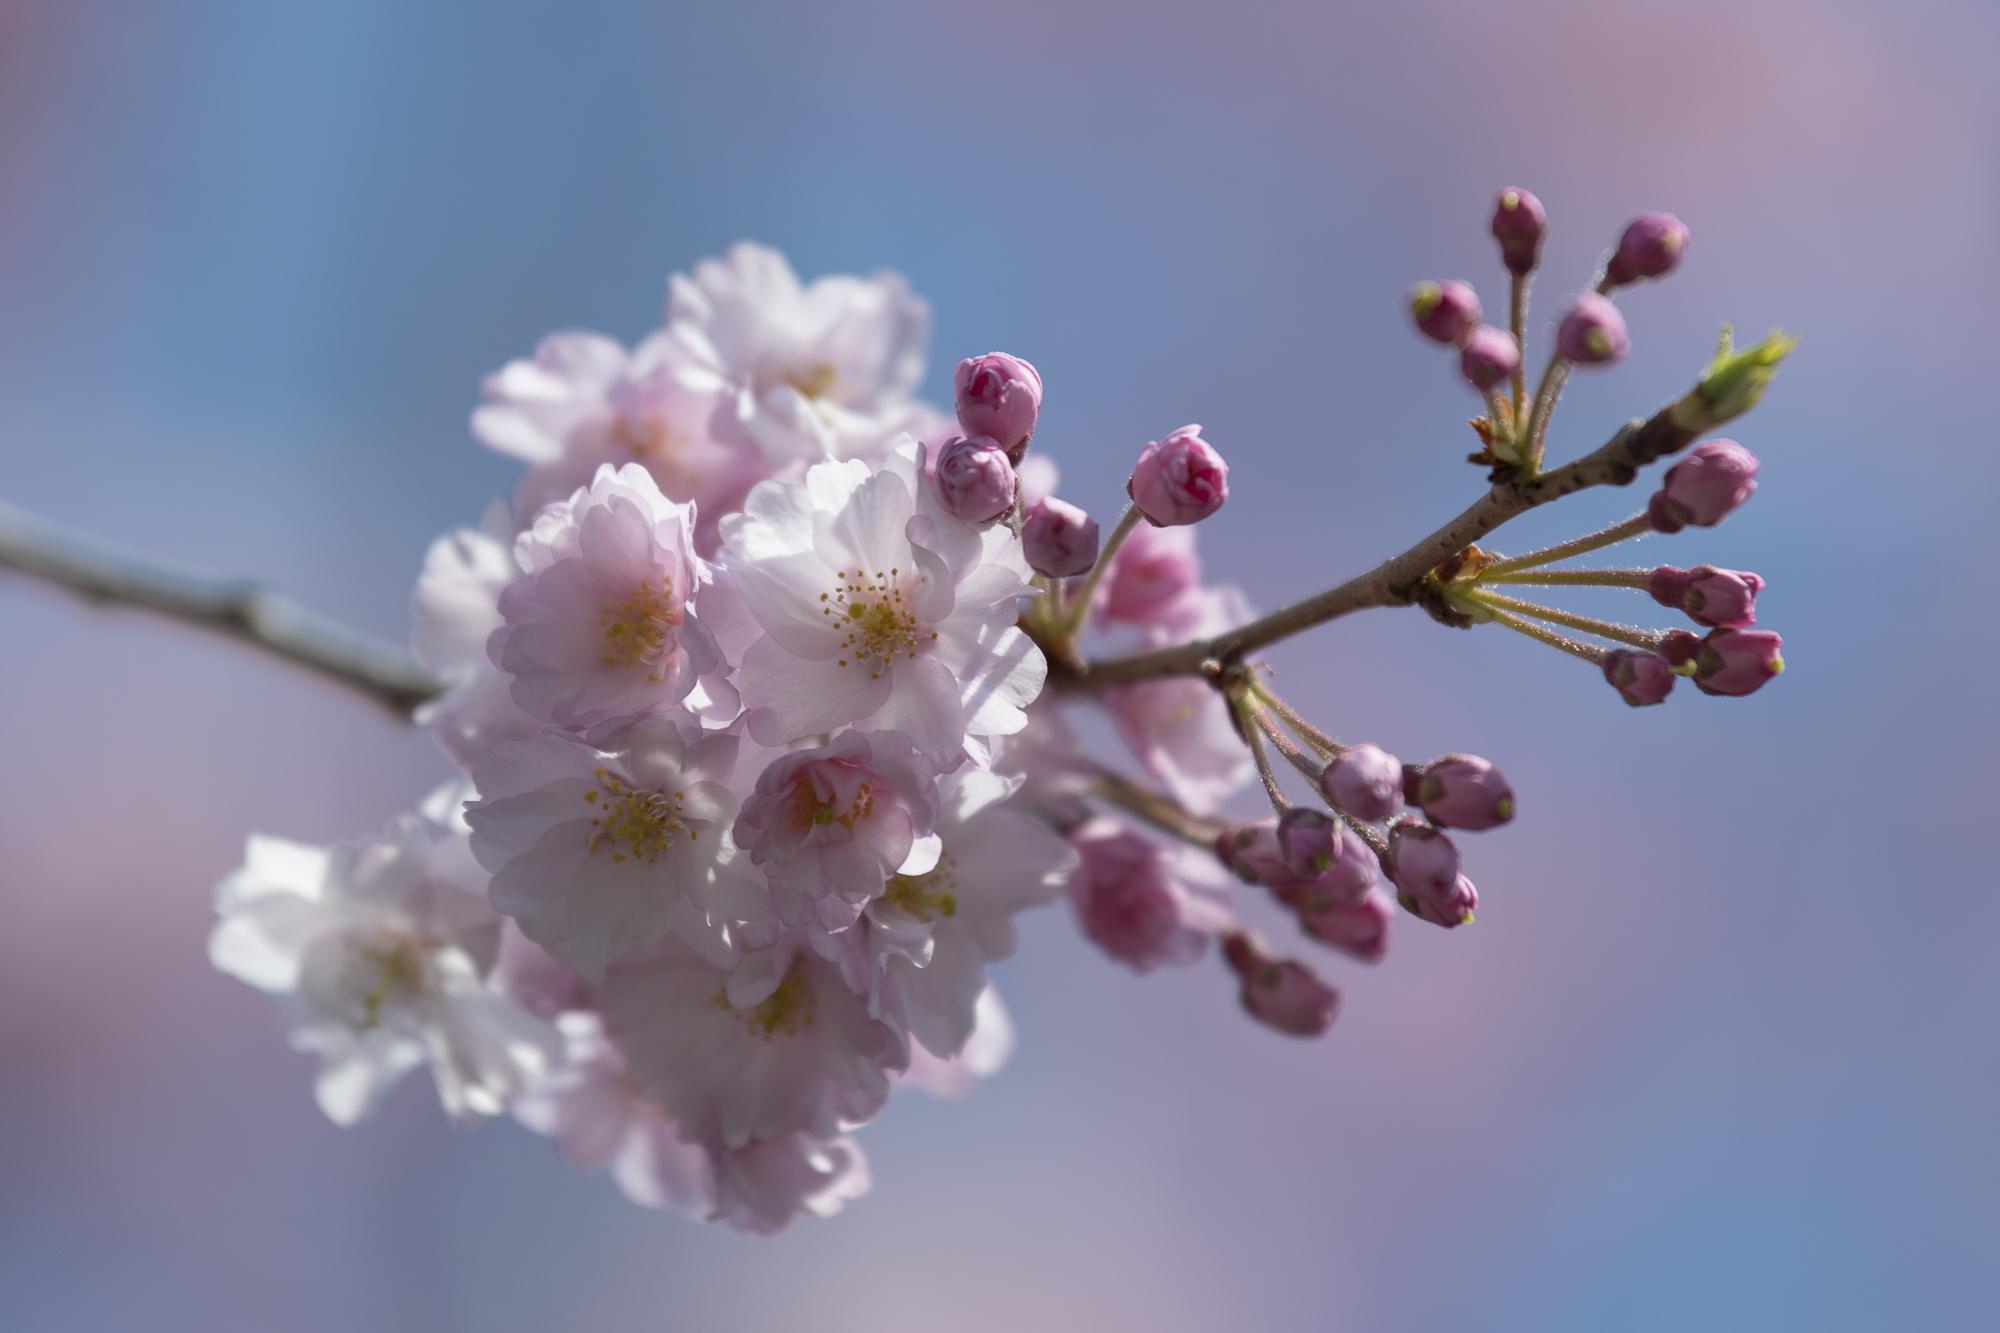 Meiji Jingu Gaien, Tokyo  Photography: Alexander J.E. Bradley • Nikon D500 • AF-S NIKKOR 70-200mm Ƒ/2.8E FL ED VR @ 200MM • Ƒ/2.8 • 1/2000 • ISO 100